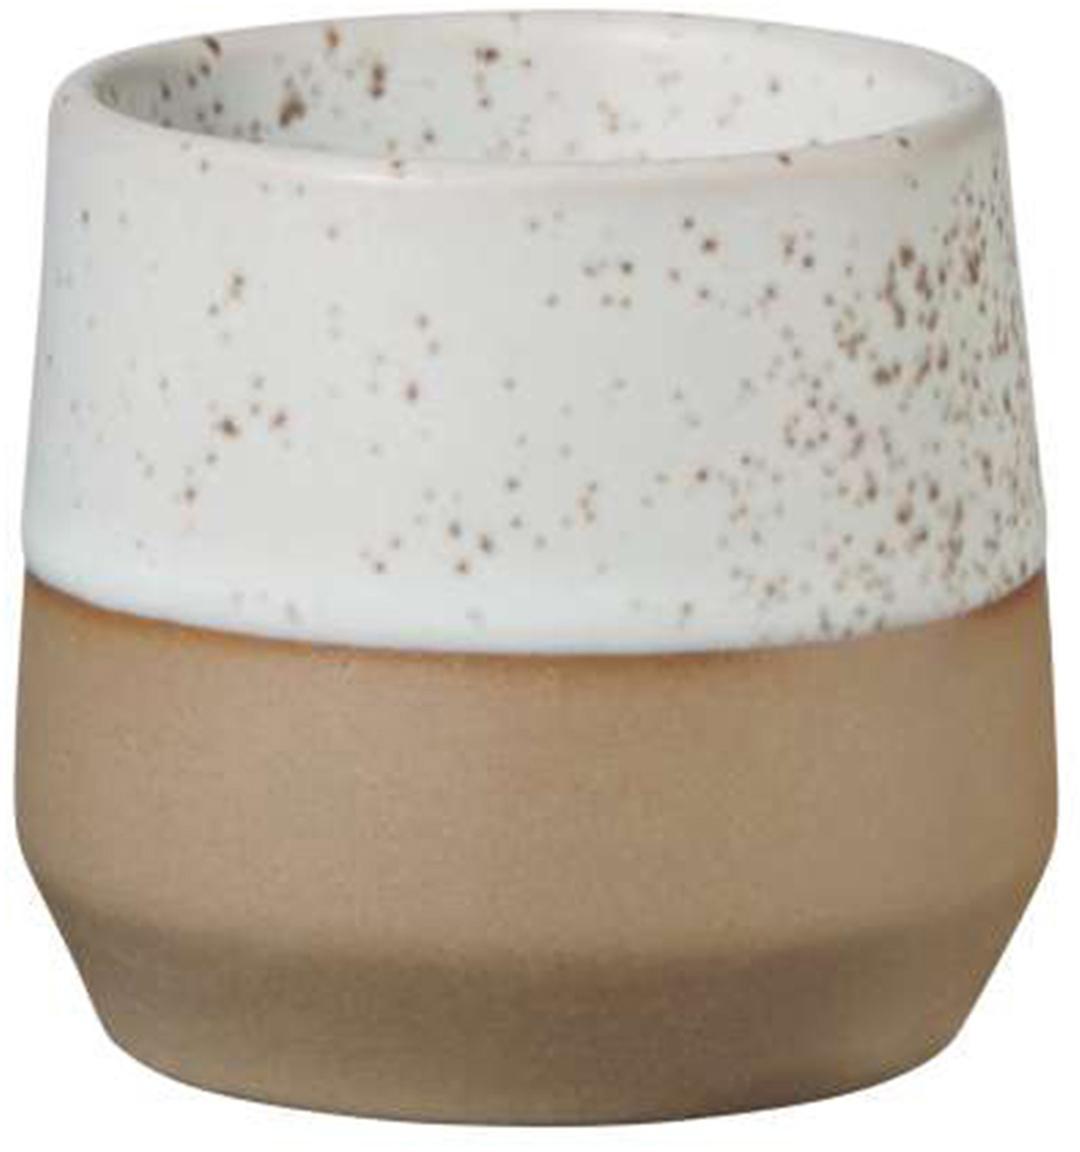 Portauova in tonalità marroni e beige Caja 2 pz, Argilla, Tonalità marroni e tonalità beige, Ø 5 x Alt. 5 cm